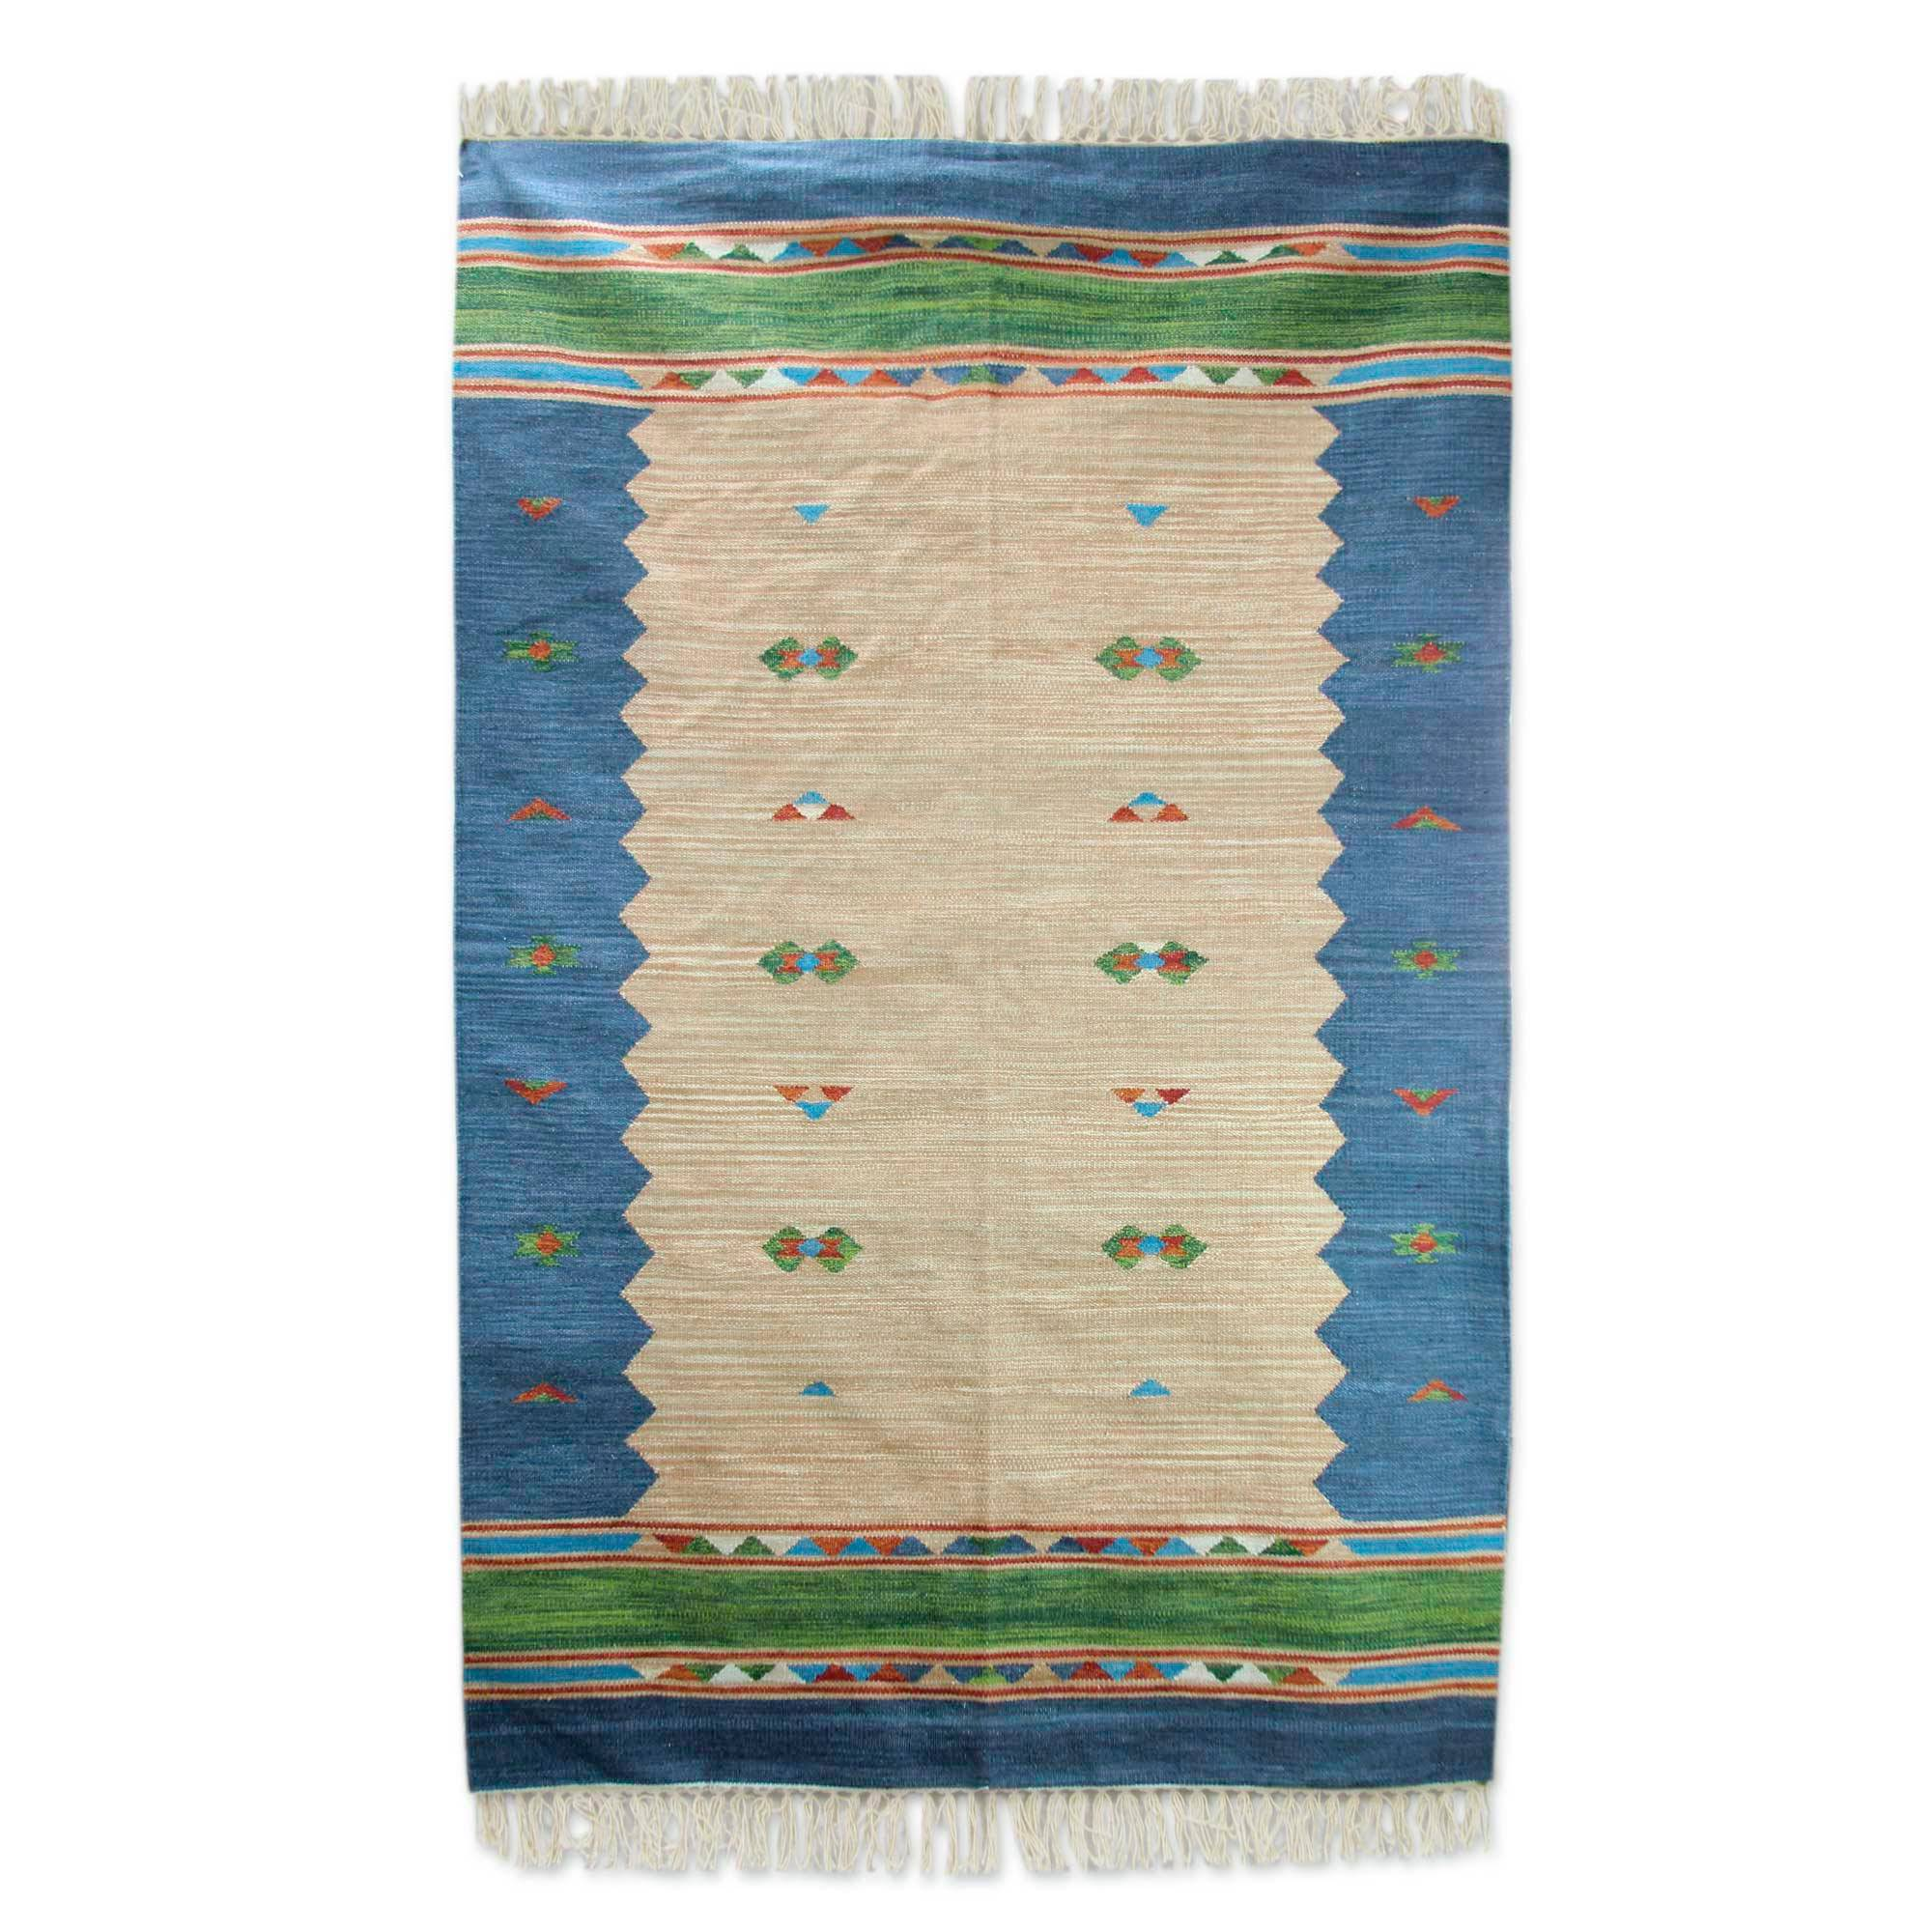 Blue Border Handwoven Wool Dhurrie Area